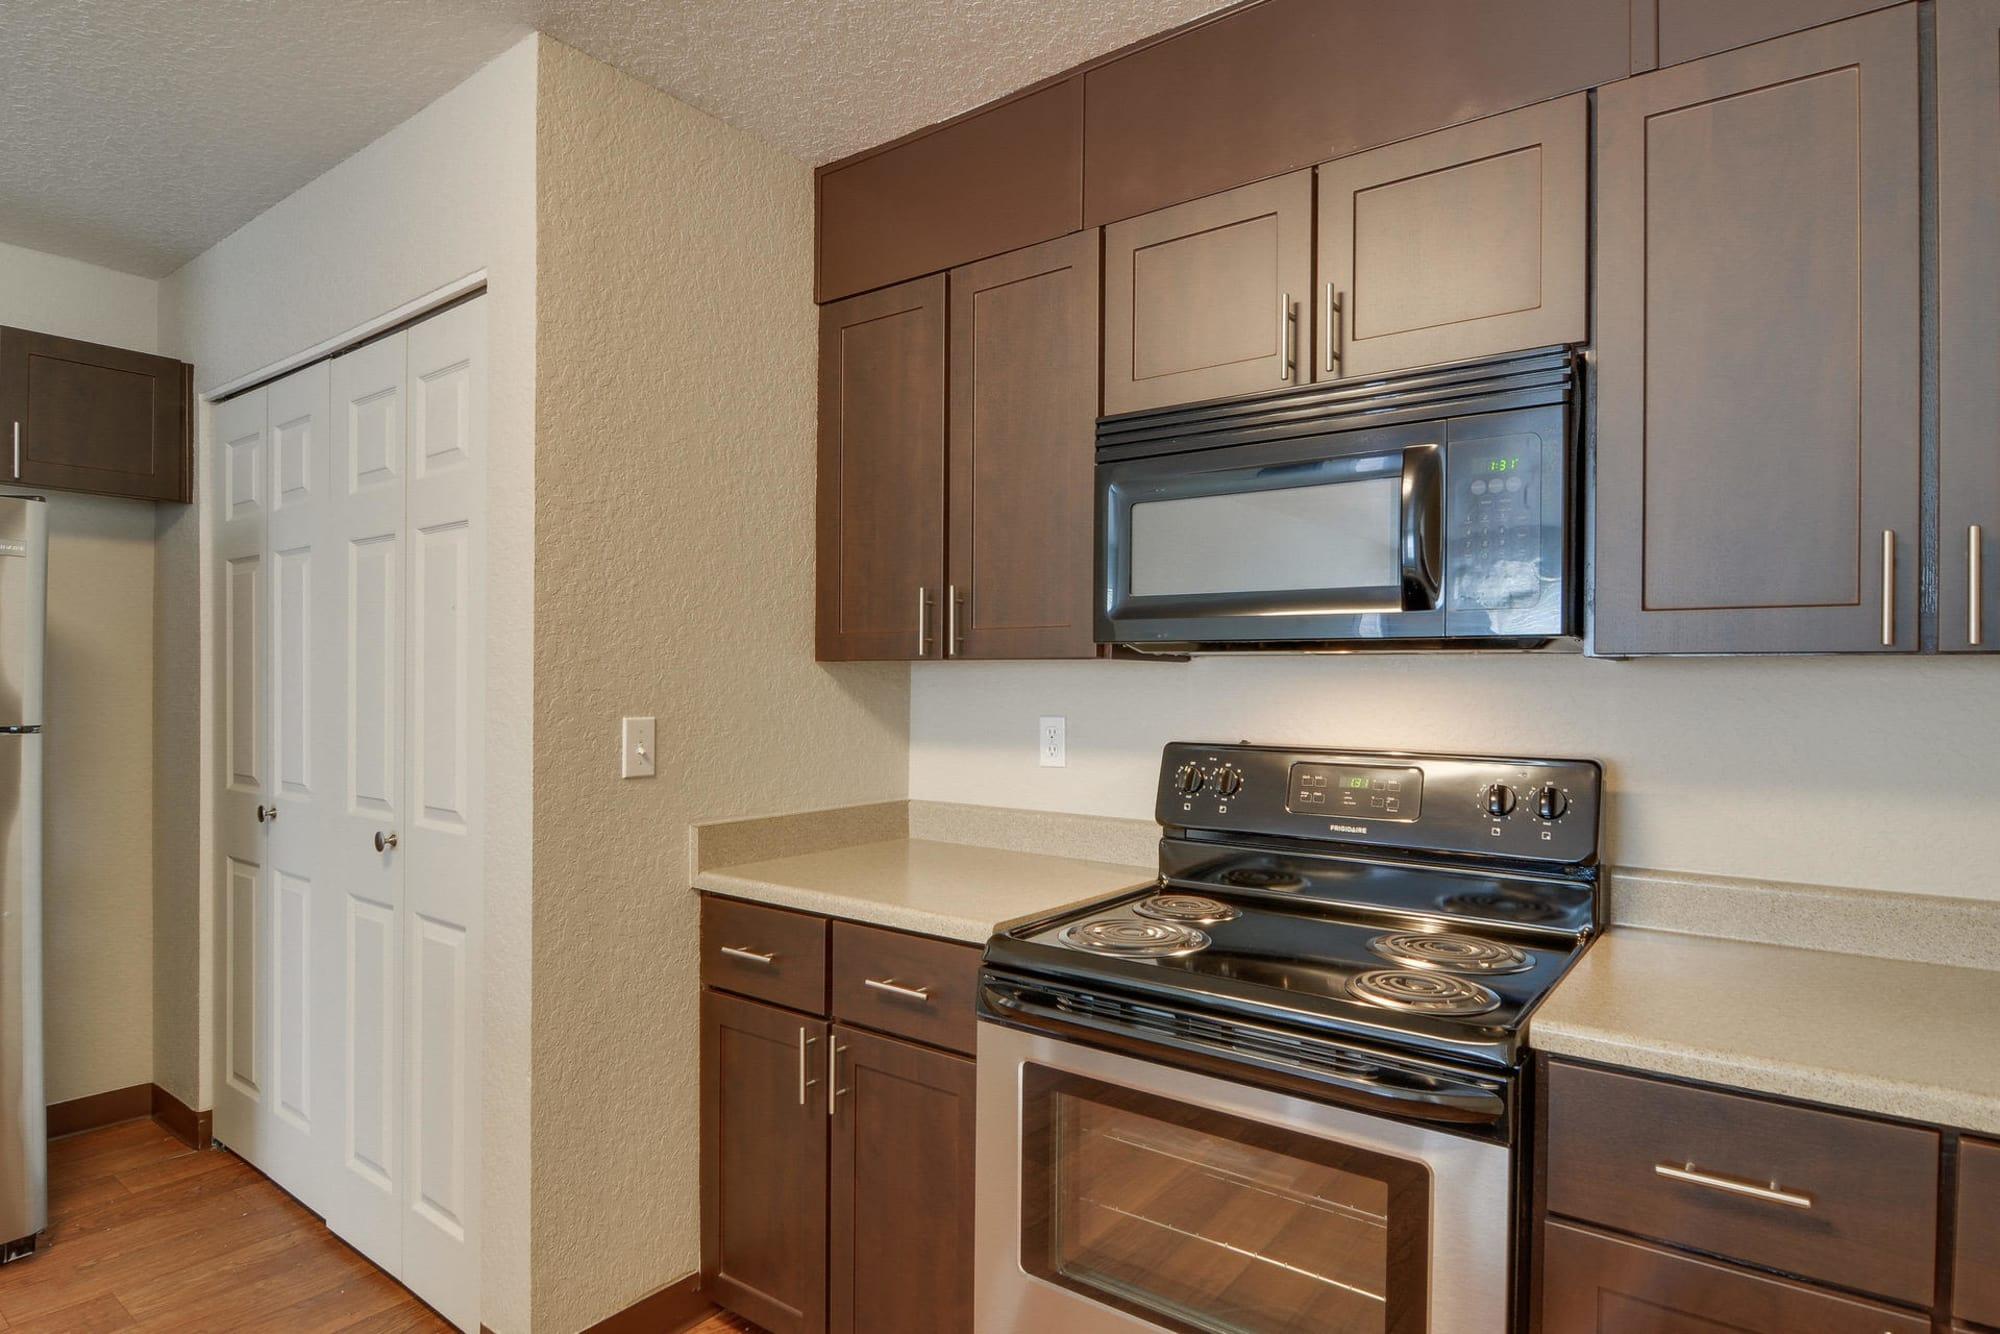 renovated brown kitchen shot